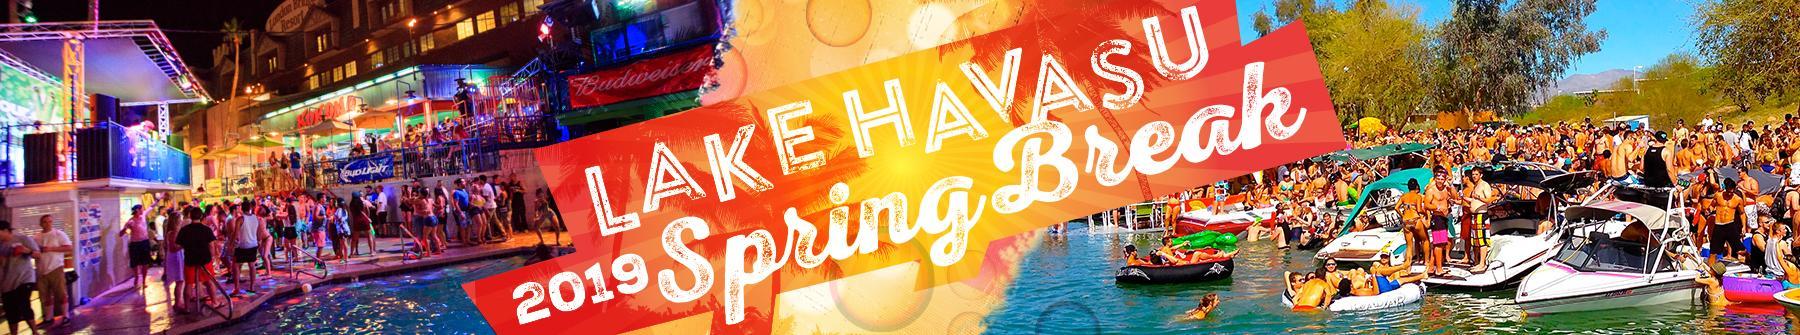 Lake Havasu Spring Break >> Spring Break Lake Havasu City